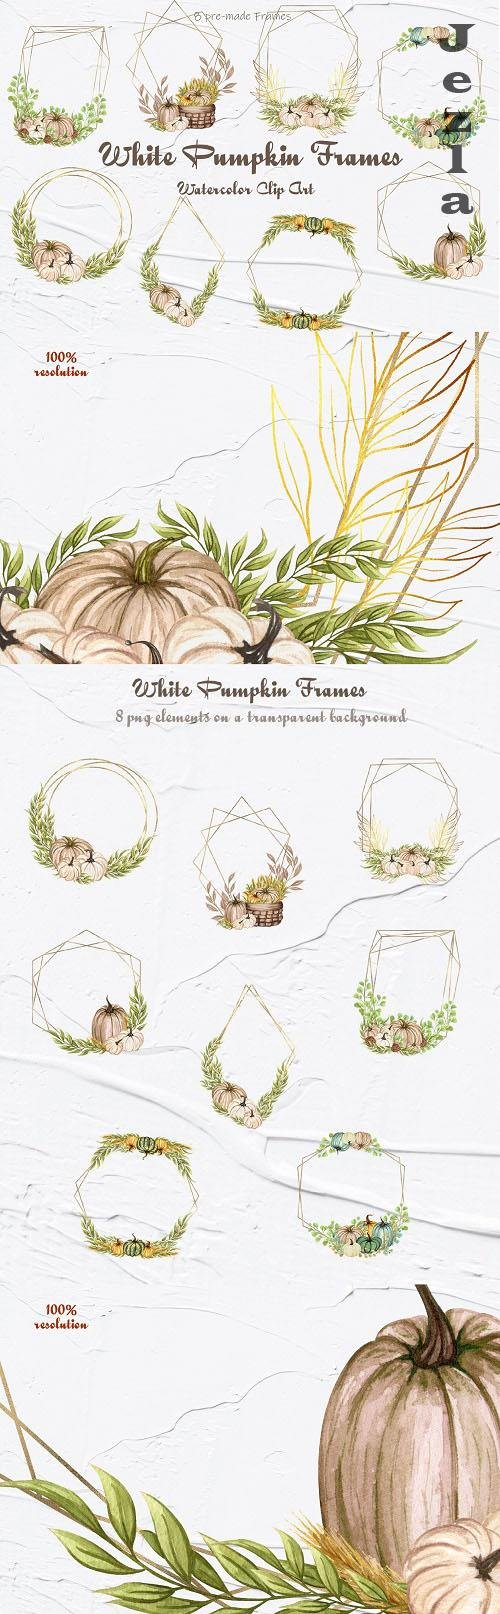 White Pumpkin Frames - 1395398